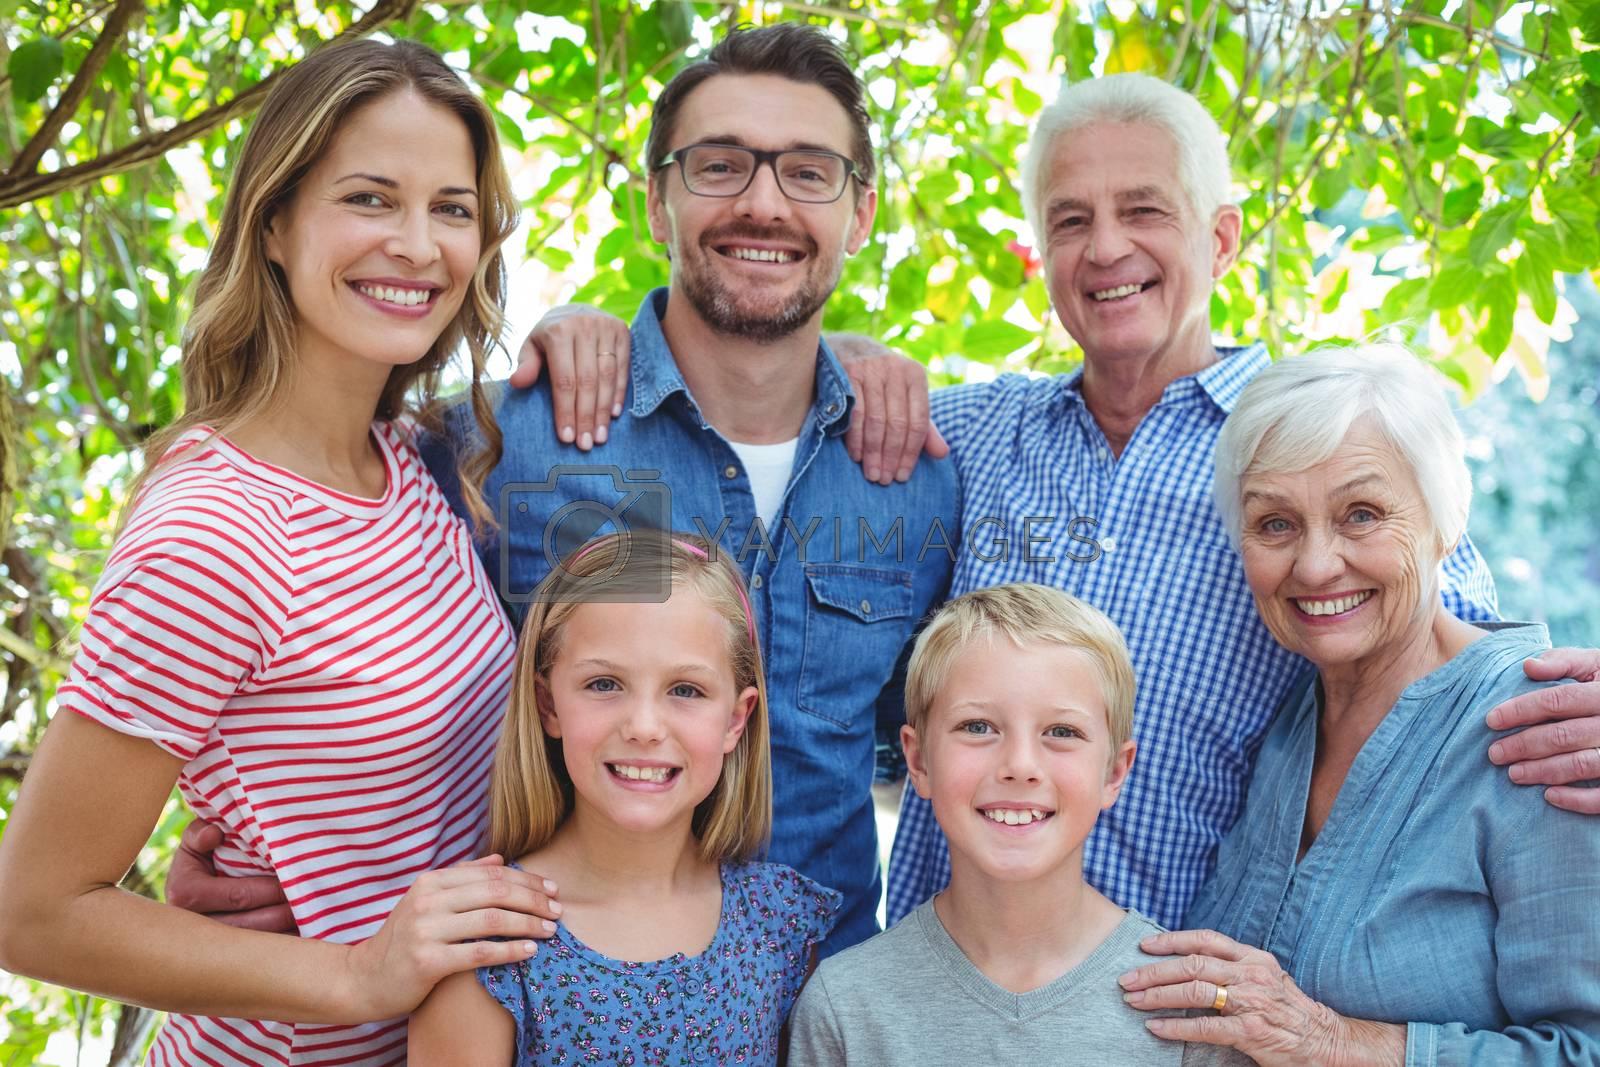 Portrait of smiling family standing against tree